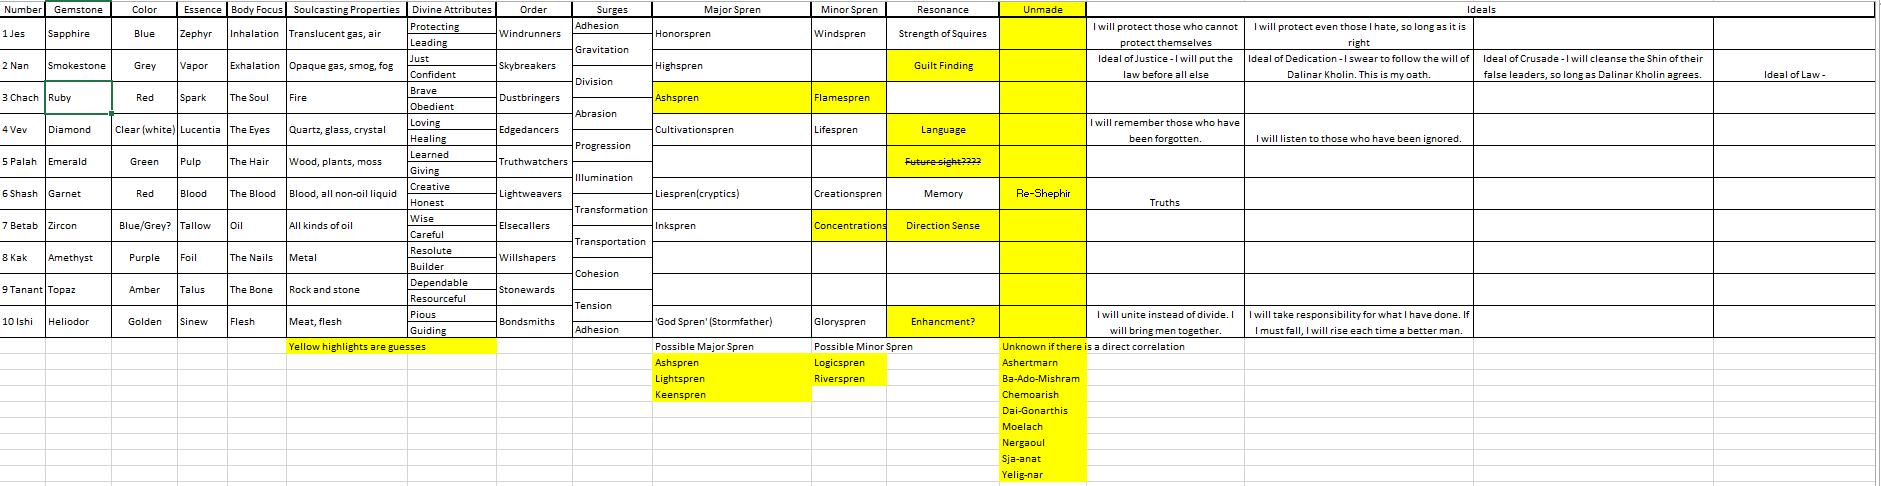 hight resolution of ob comprehensive surgebinding chart stormlight archive 17th5a1449a9274ca stormlightchart thumb png d89032245da83a23ace3263a72ec73f5 png stormlight pdf